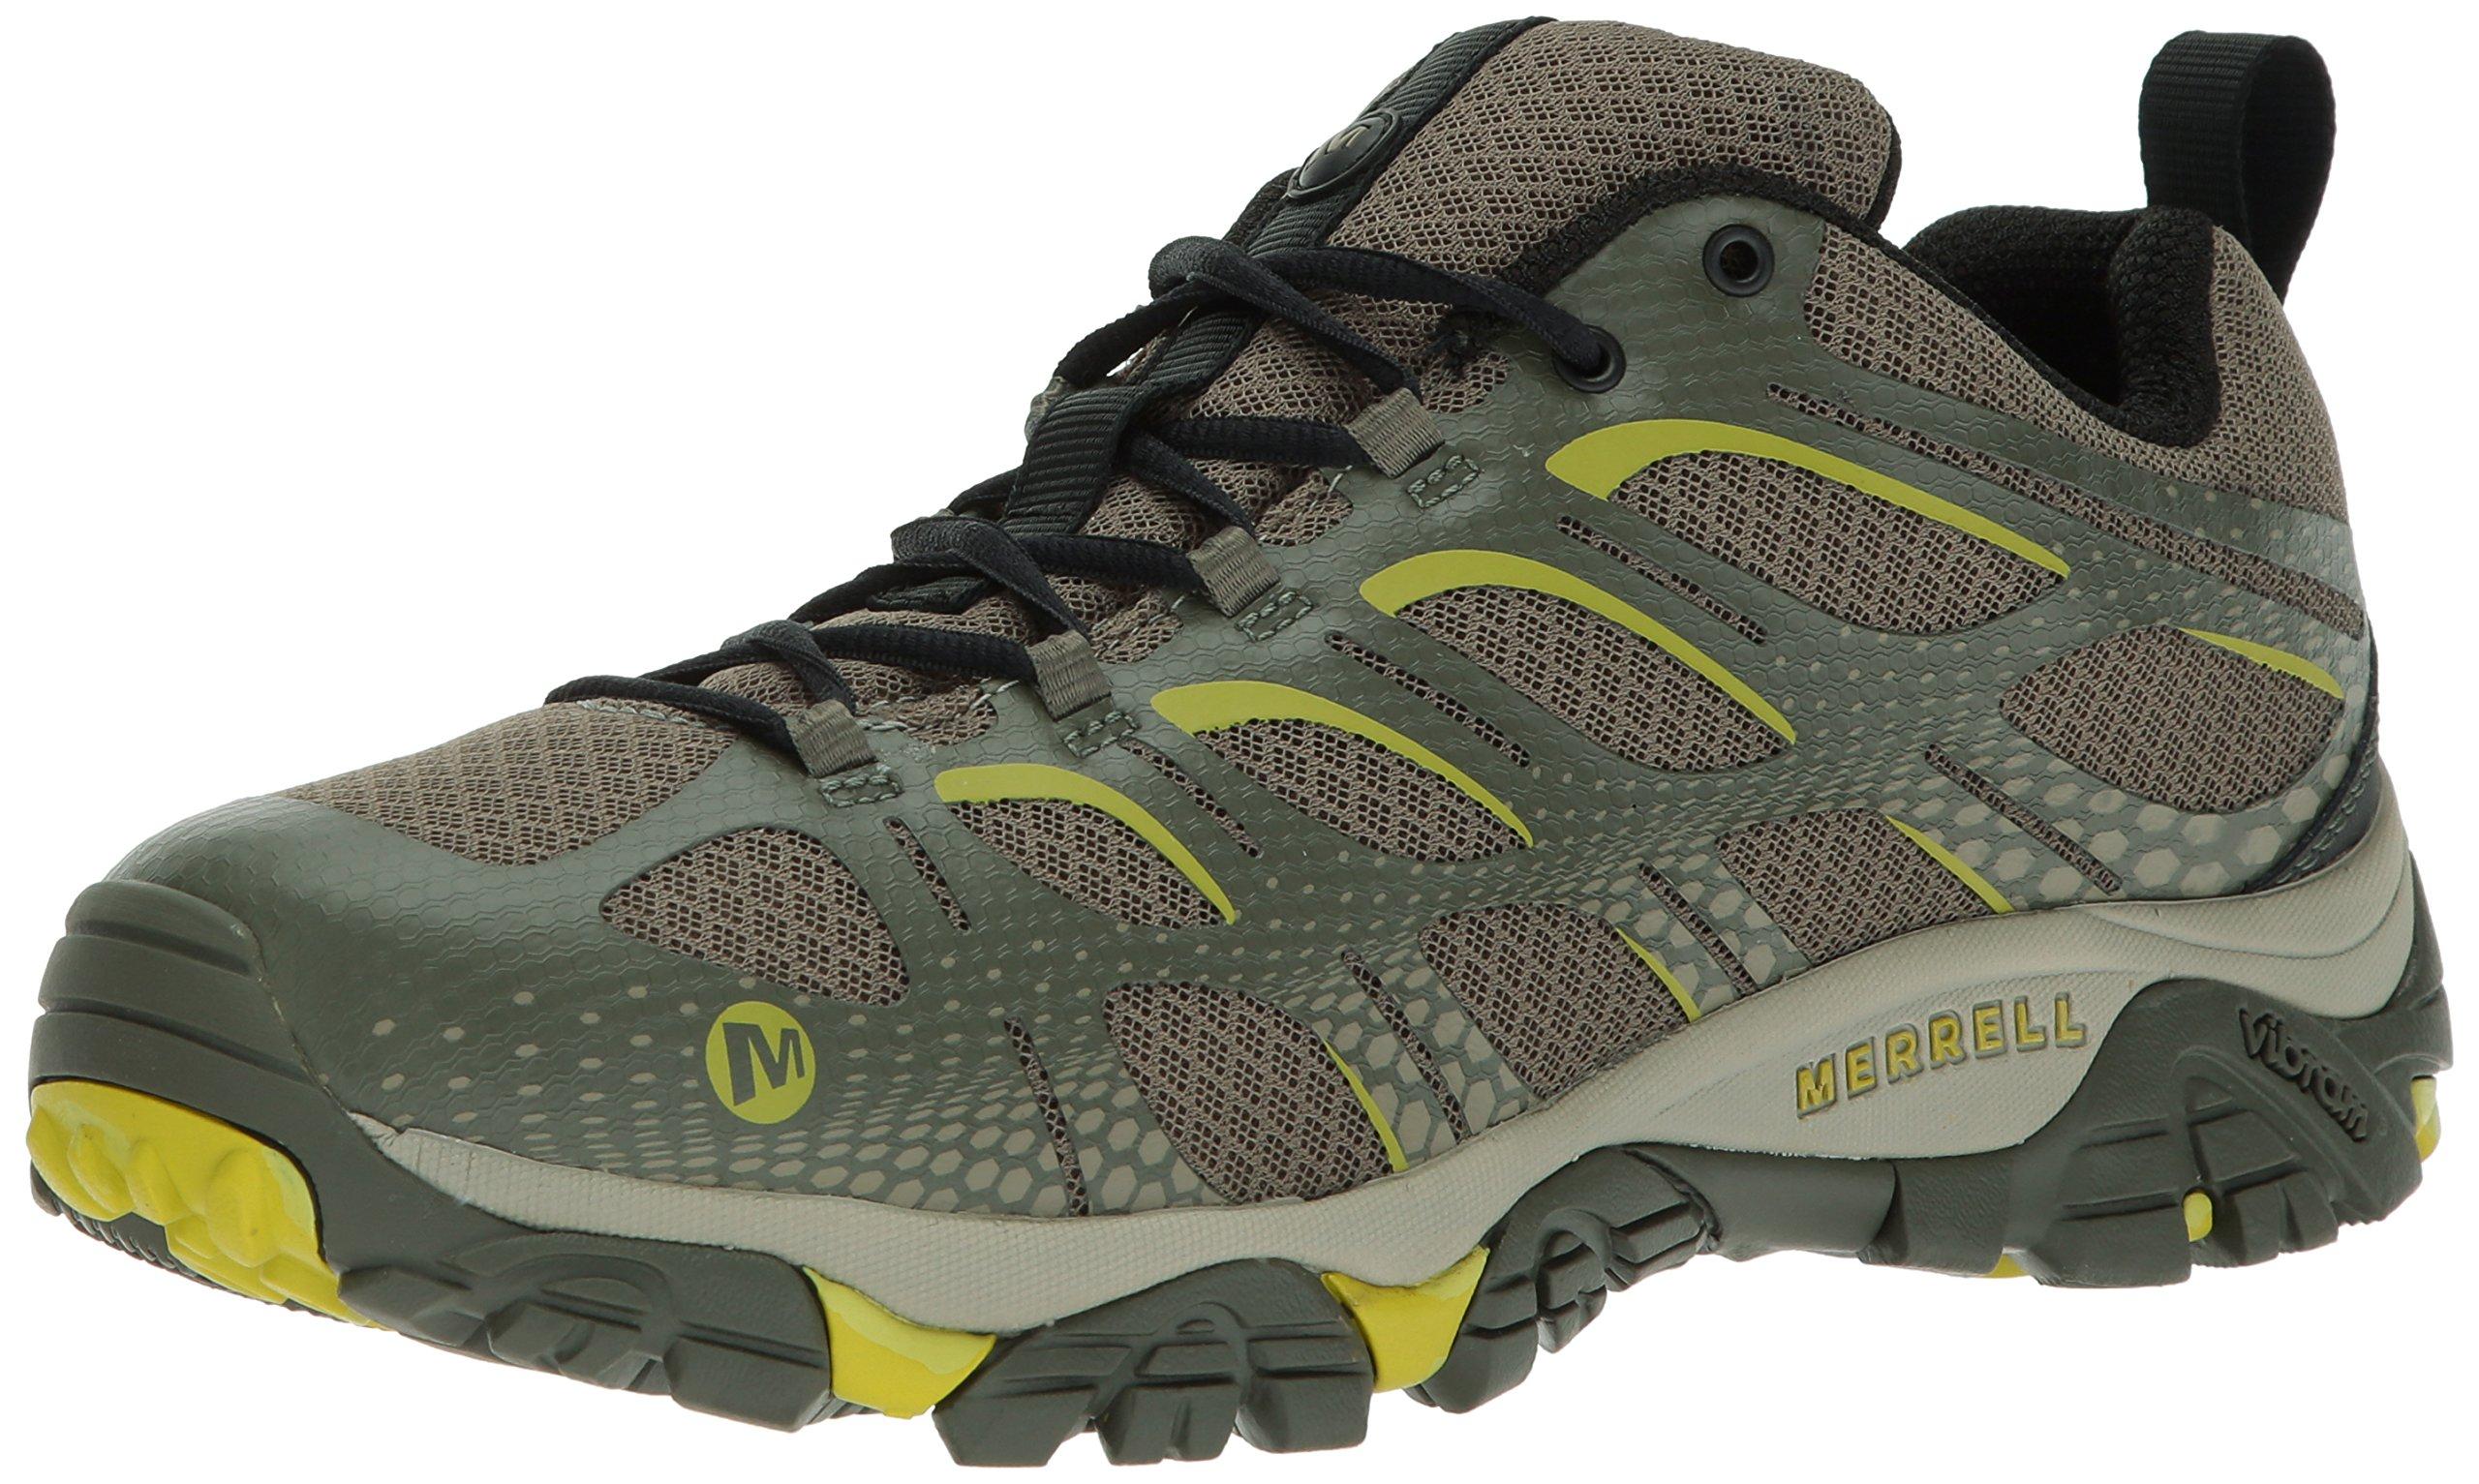 Merrell Men's Moab Edge Hiking Shoe, Dusty Olive, 10 M US